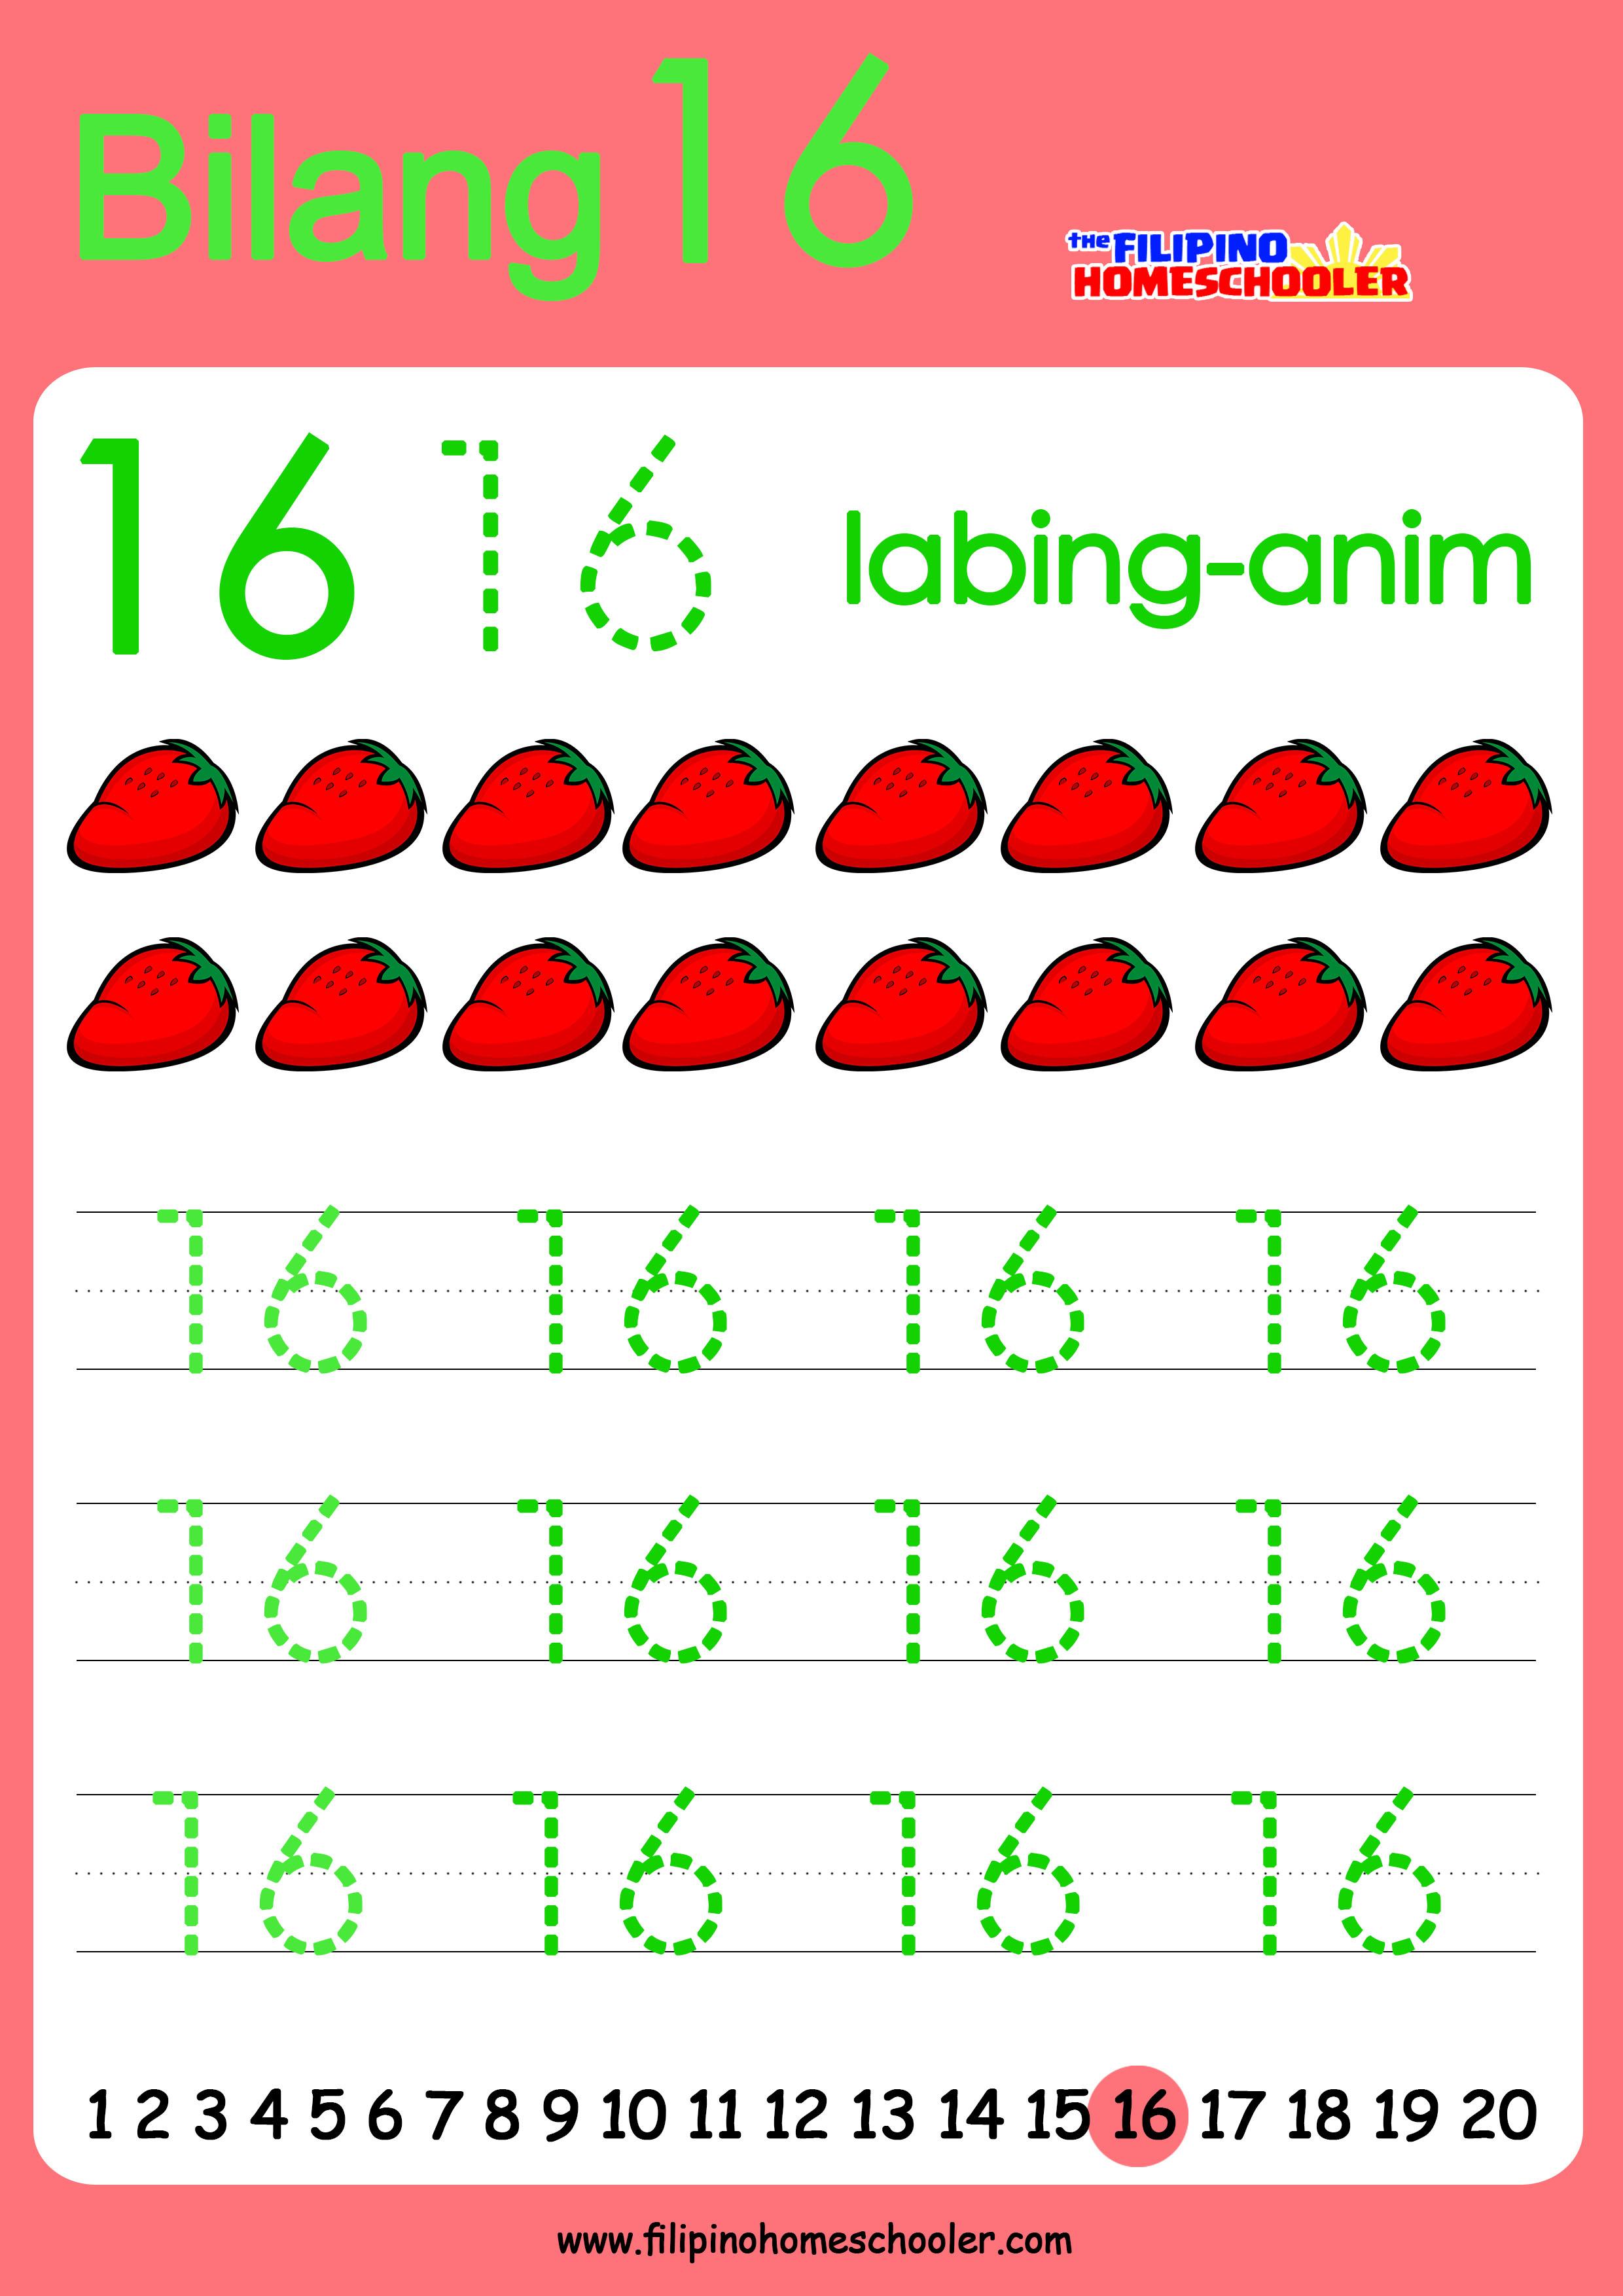 Free Filipino Numbers Worksheets From 11 20 The Filipino Homeschooler